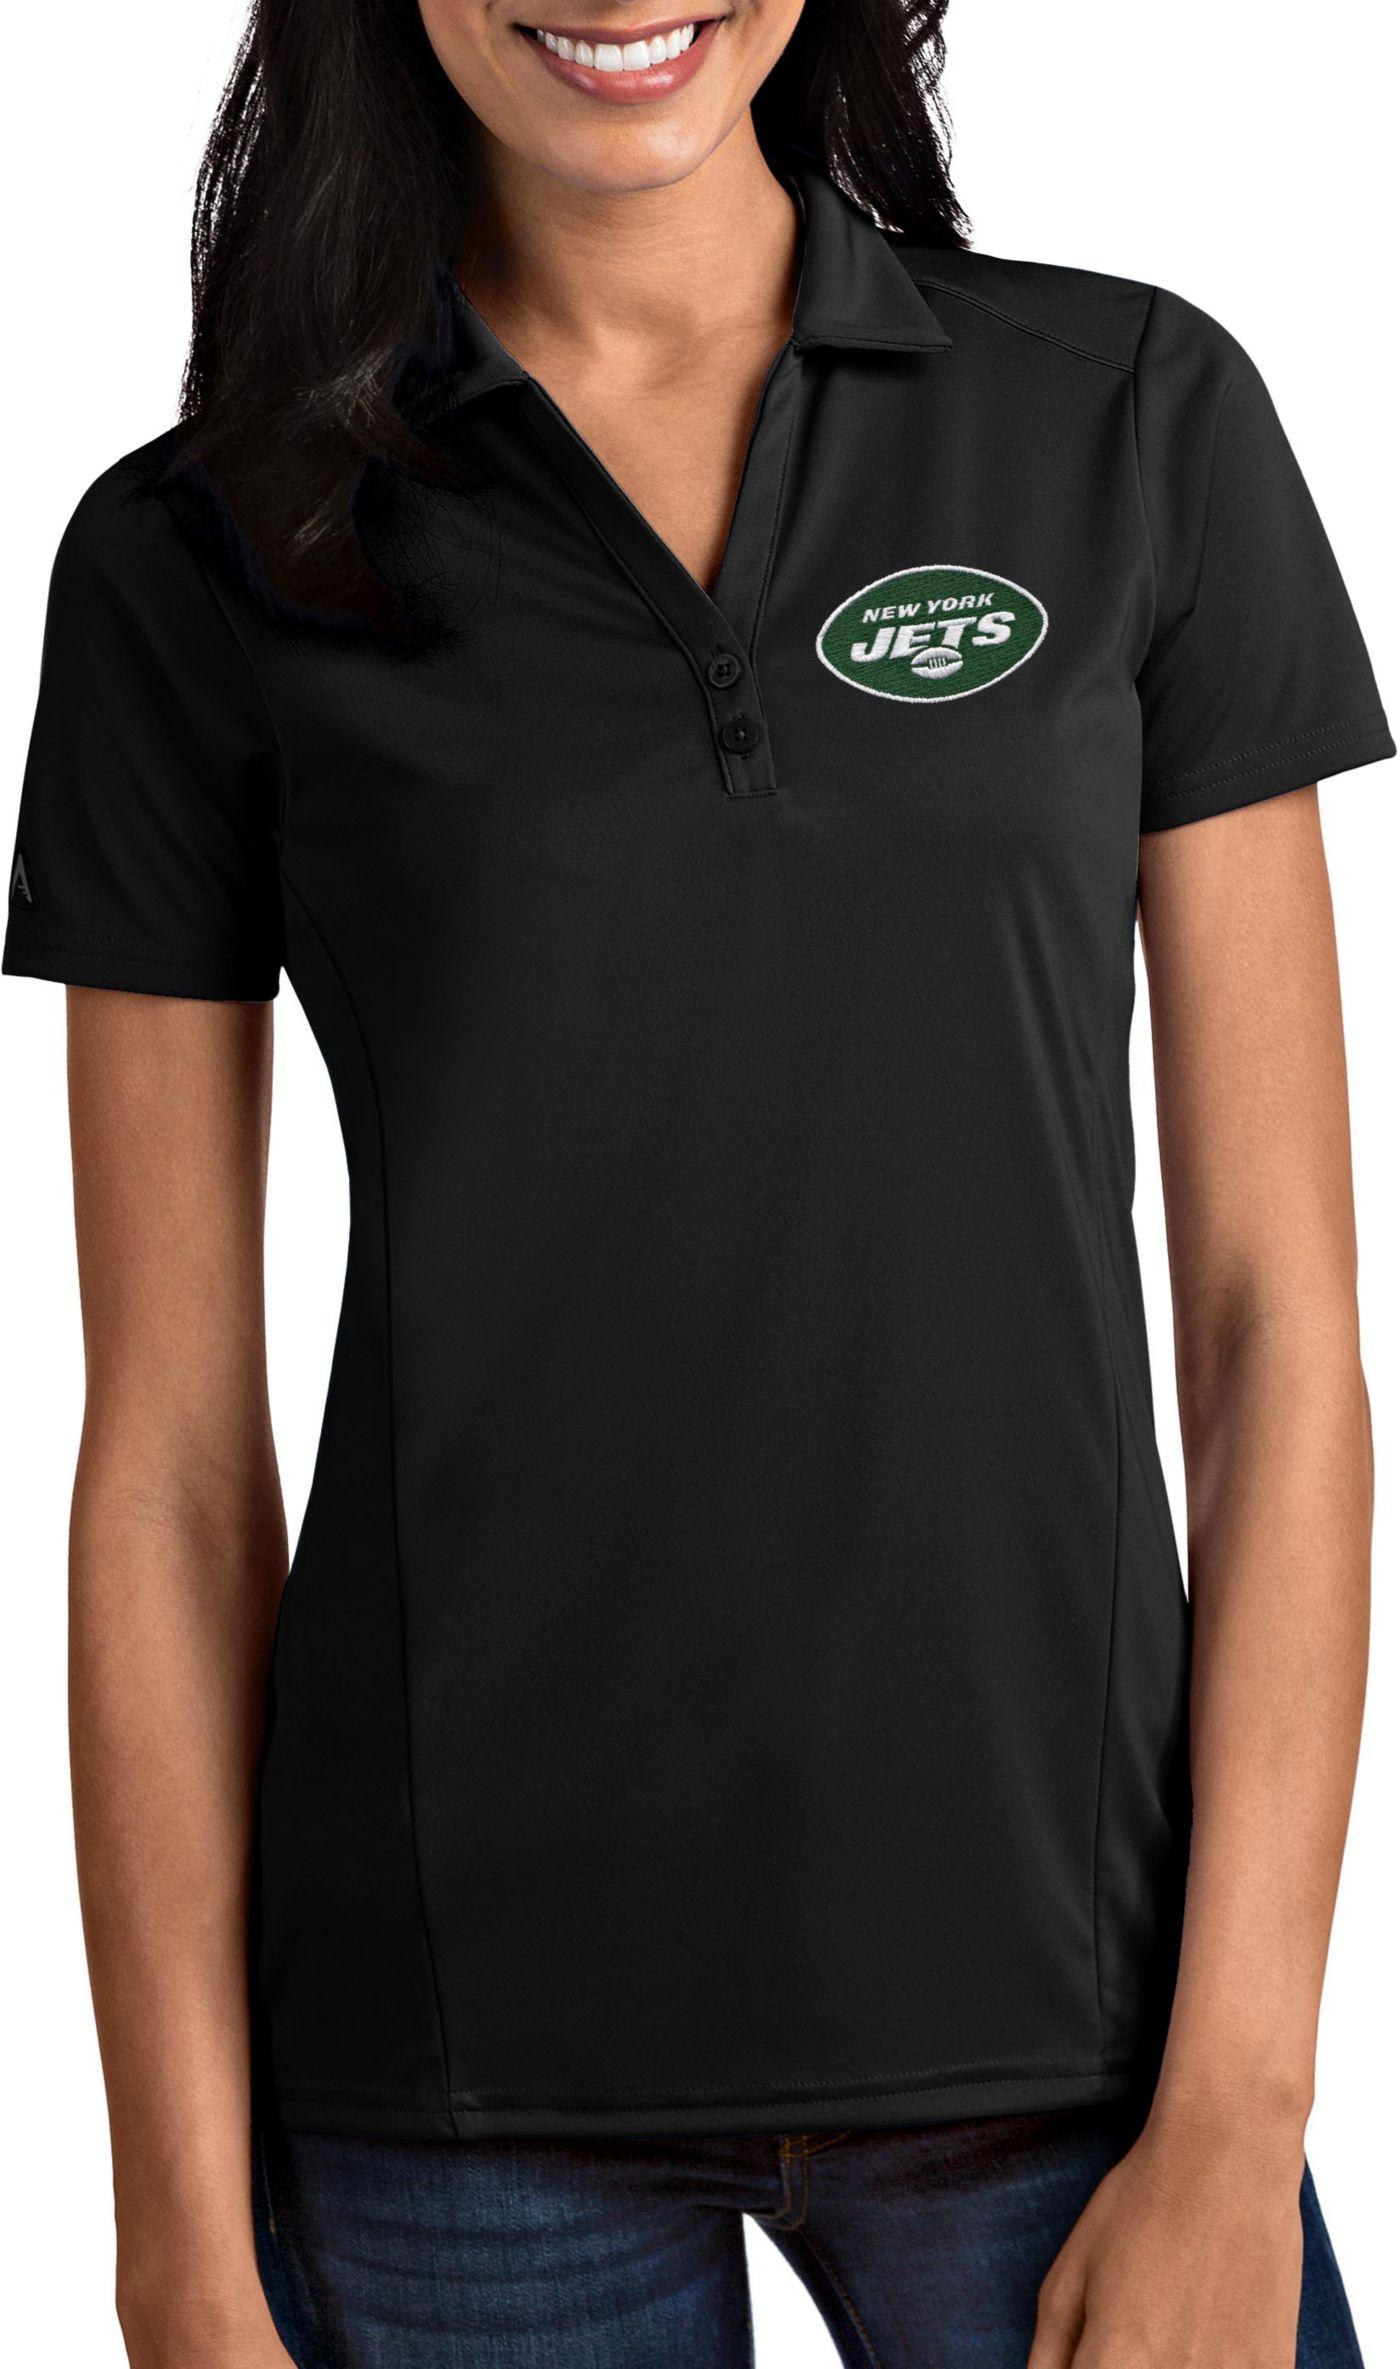 Antigua Women's New York Jets Tribute Black Polo